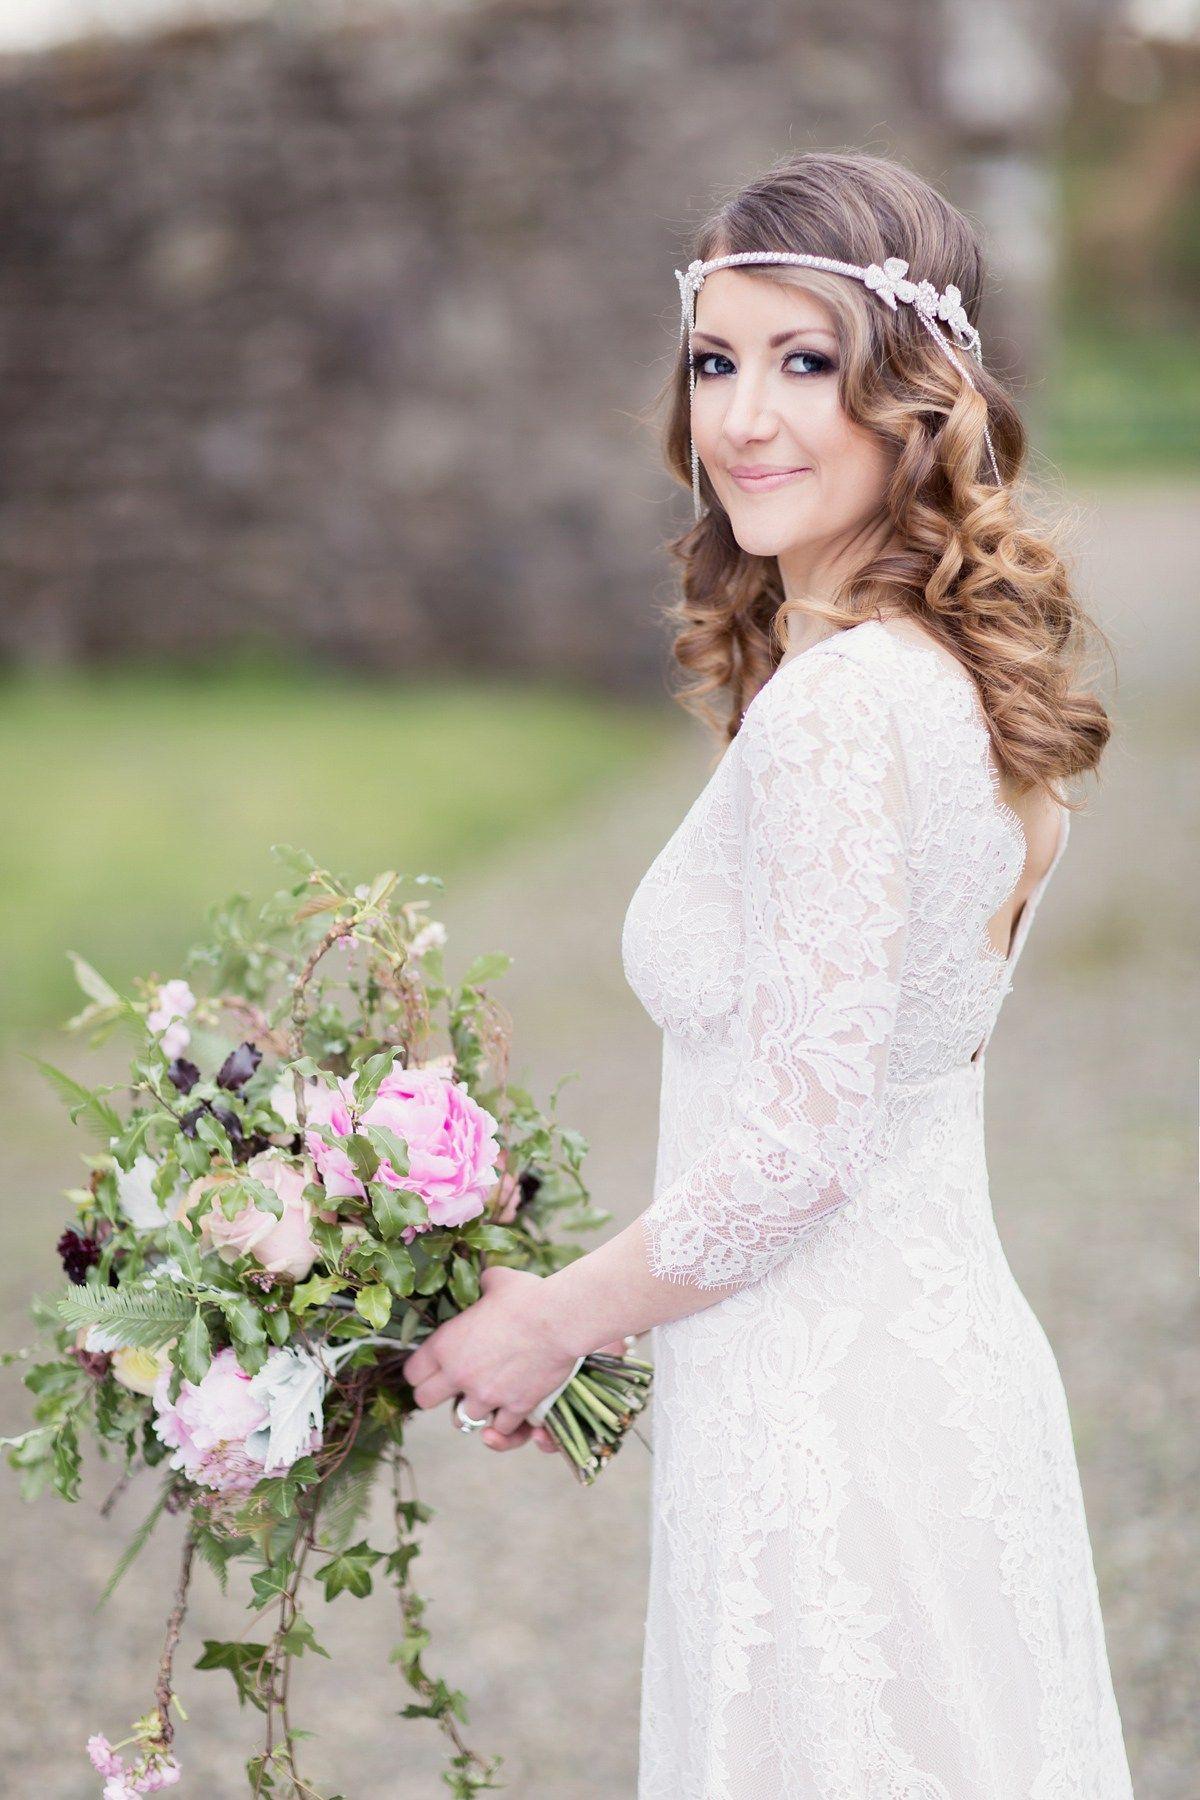 Scottish wedding dresses  A Scottish Springtime Fairytale Wedding for a Claire Pettibone